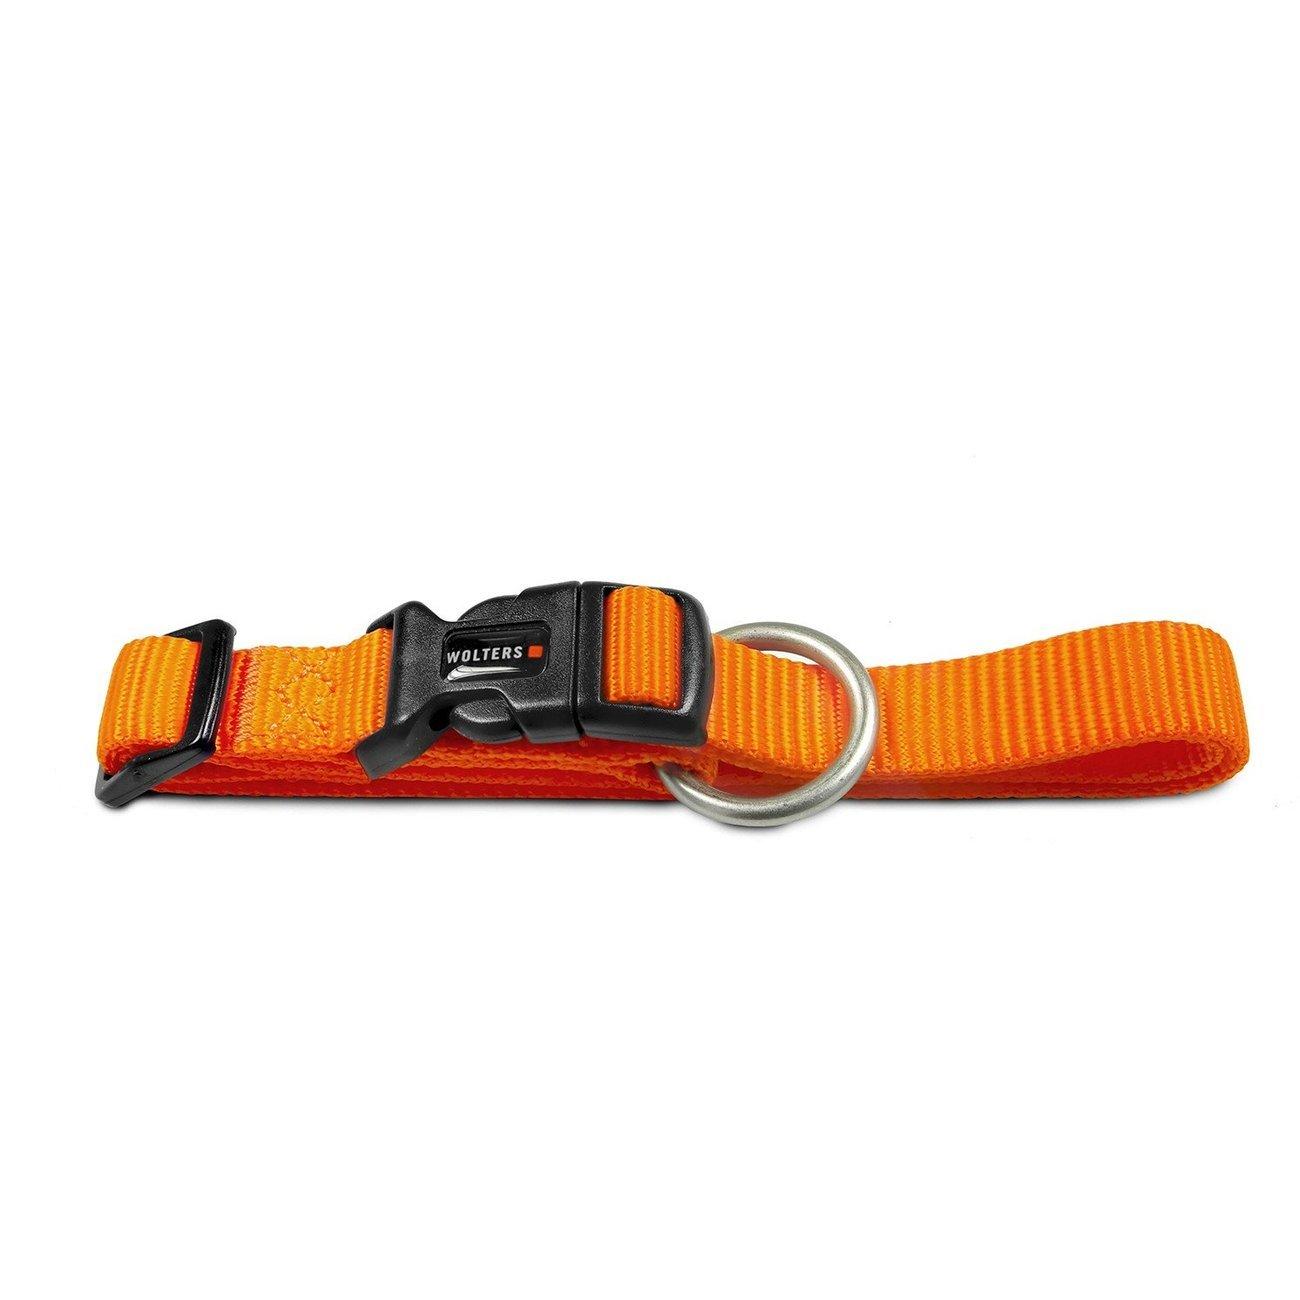 Wolters Halsband Nylon Professional, Bild 9